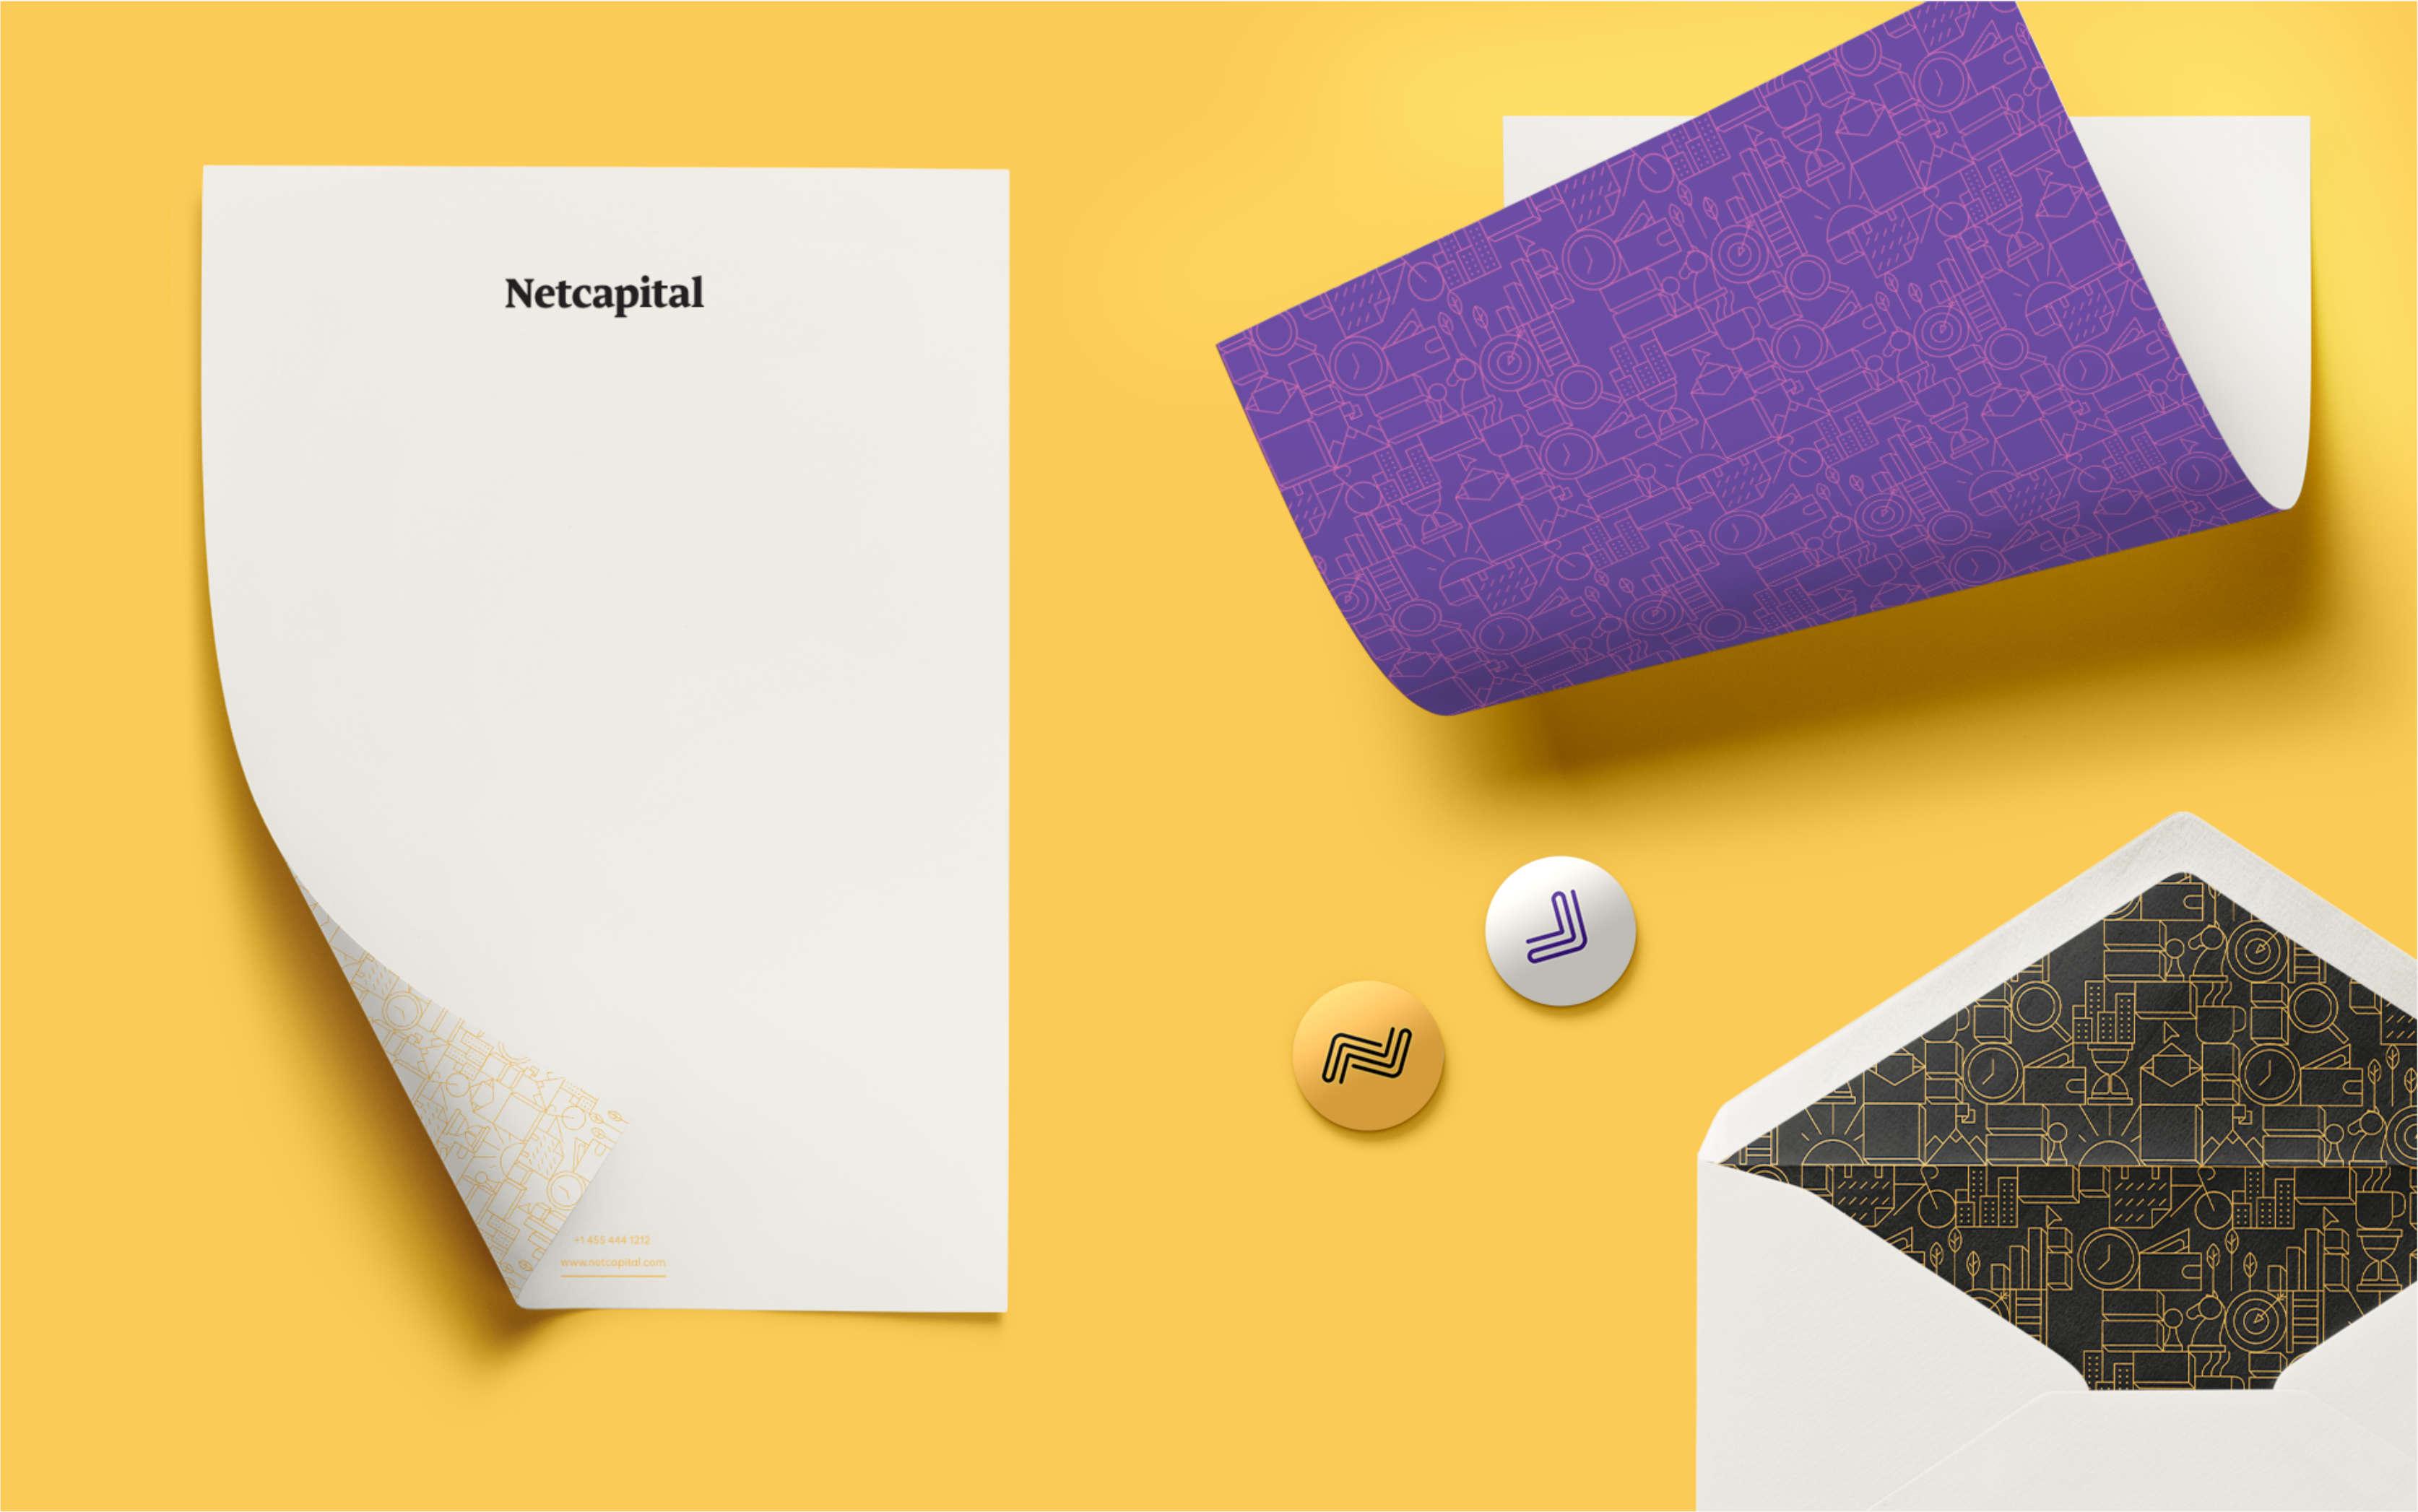 Netcapital Branding Collateral Design